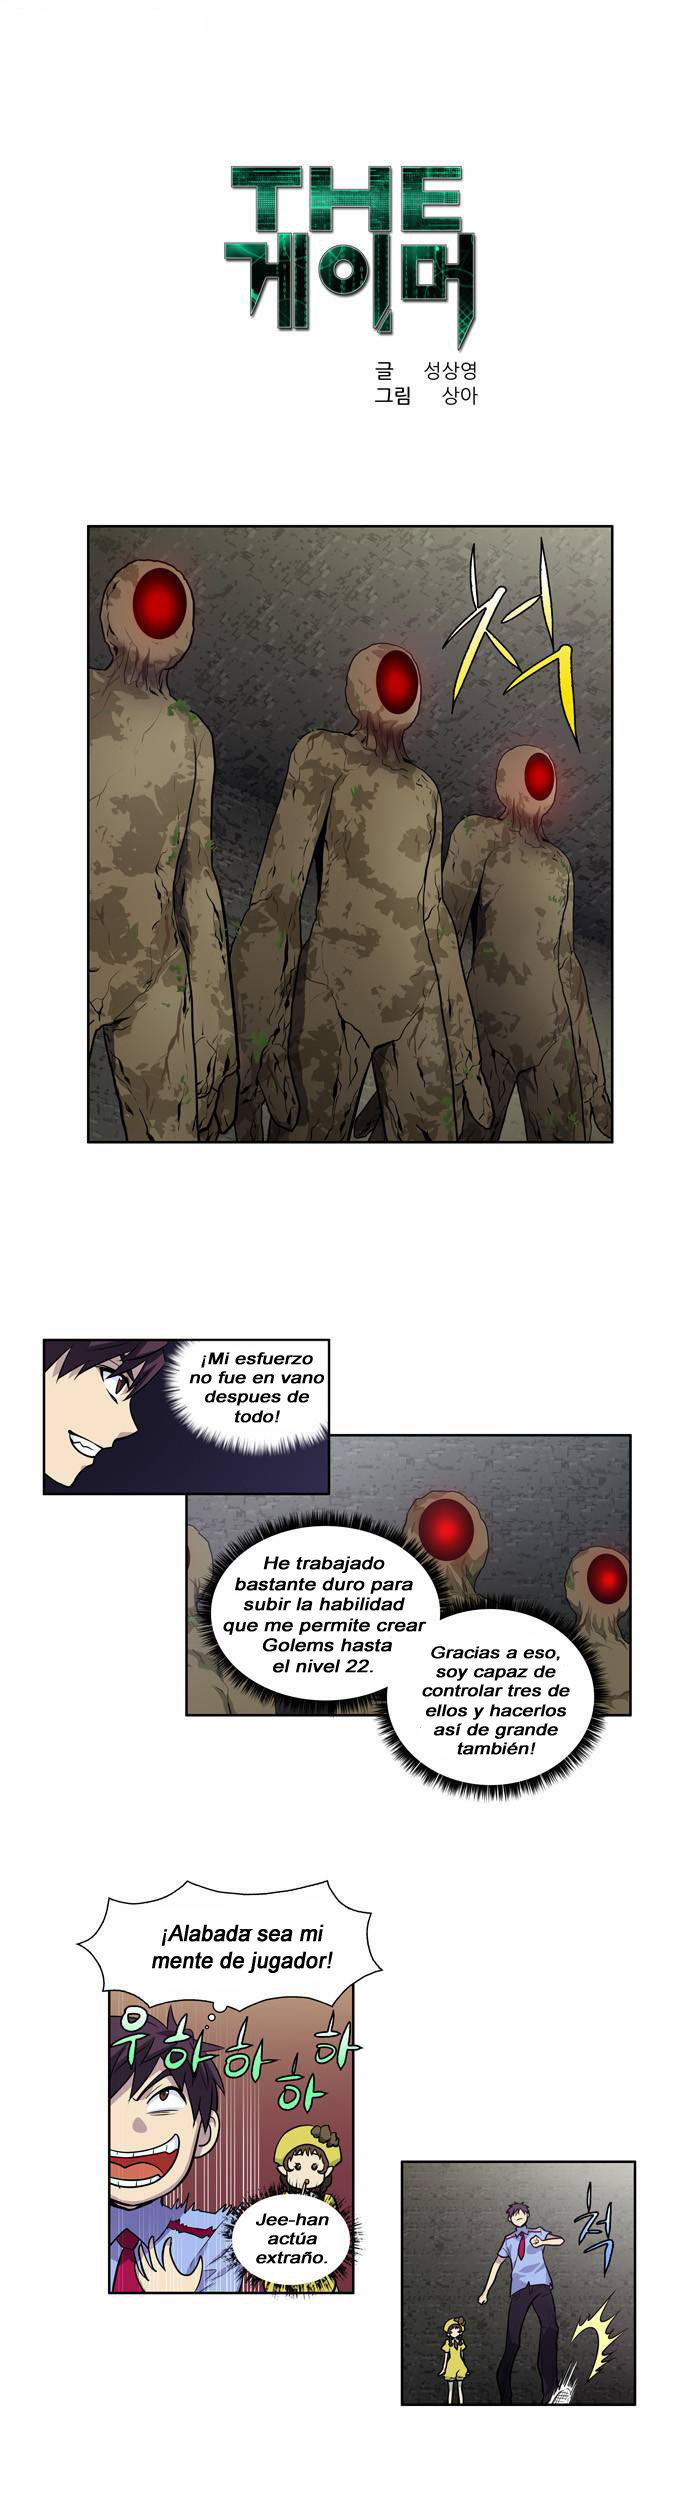 http://c5.ninemanga.com/es_manga/61/1725/396911/b9b5c1aceaf0491b0c041bca34418f07.jpg Page 2